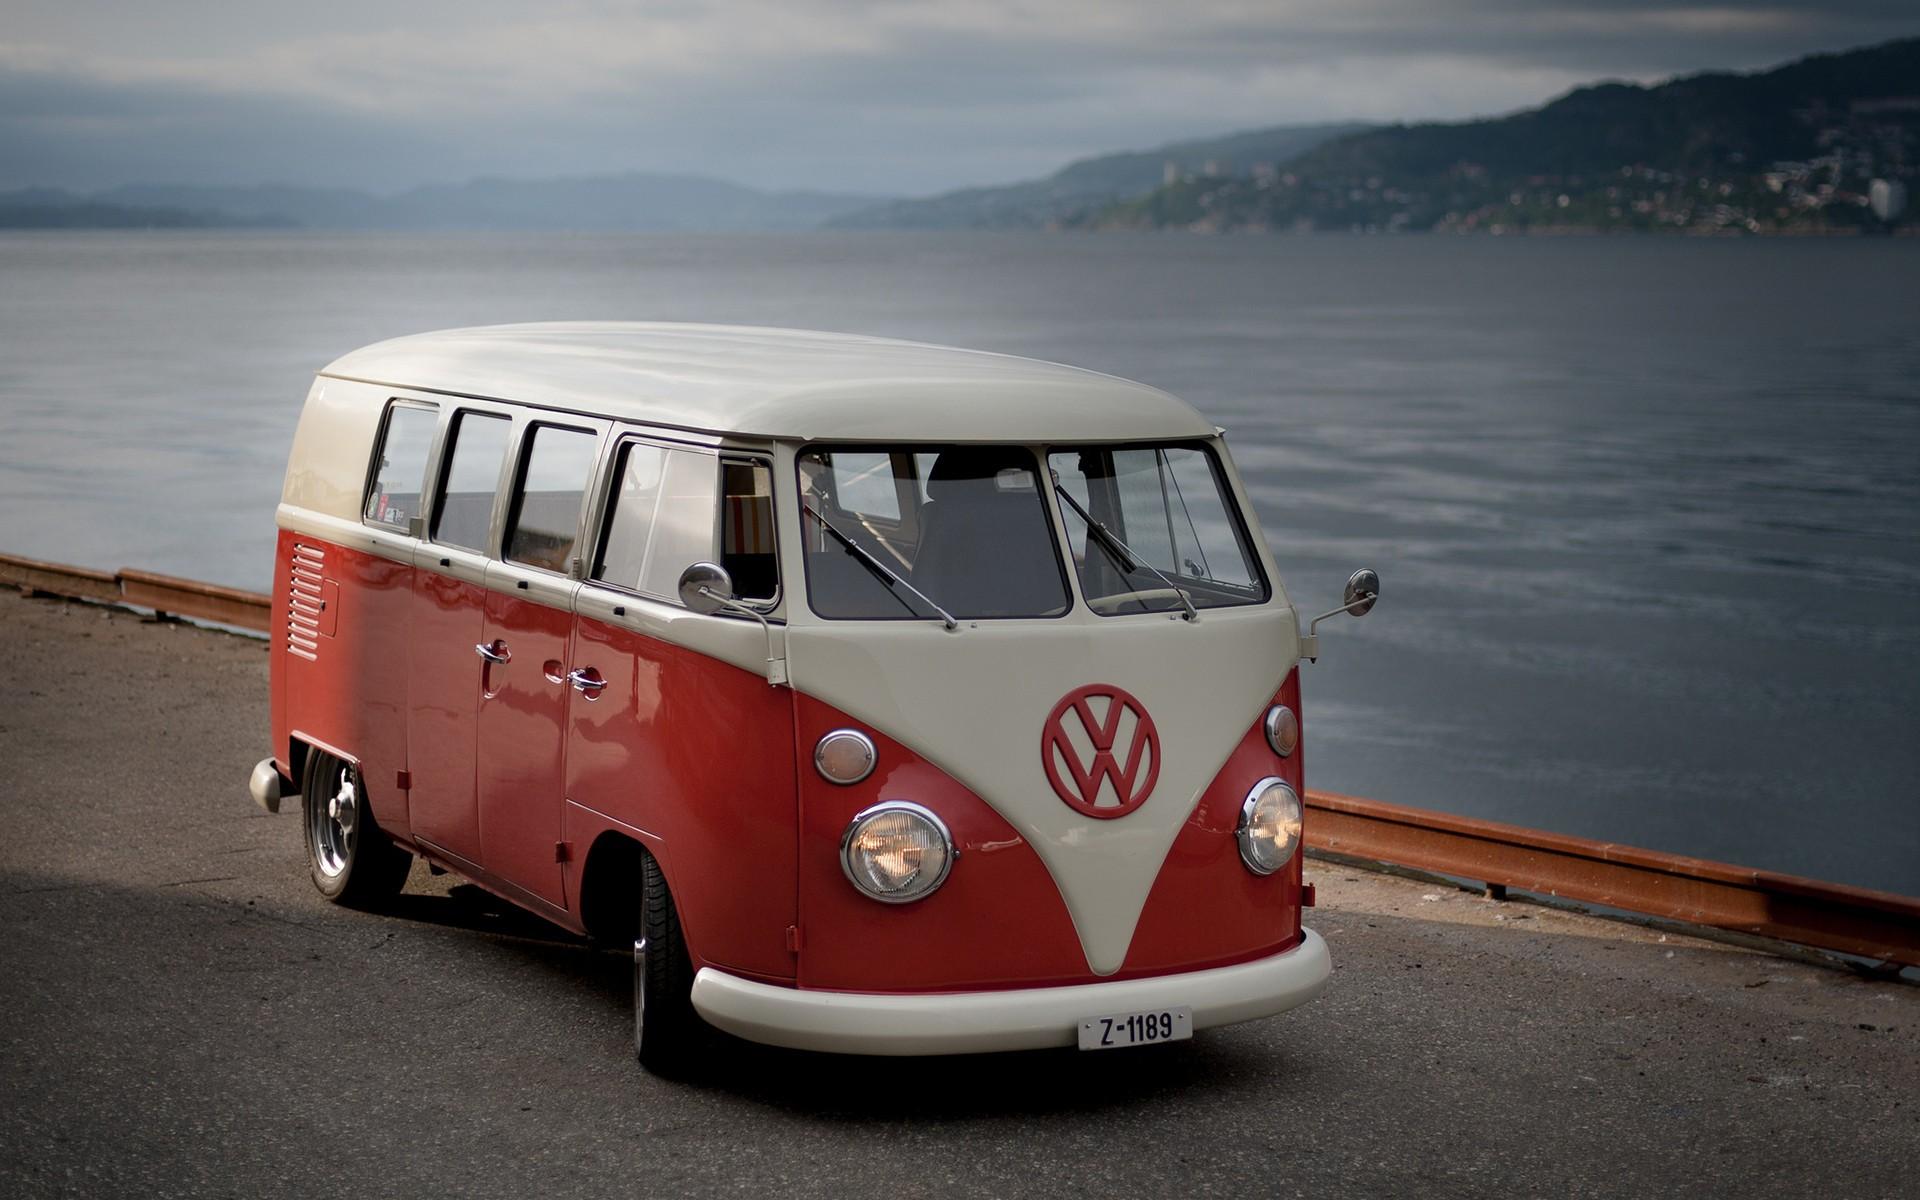 vintage caravan on ebay Old Classic Car - oukas.info